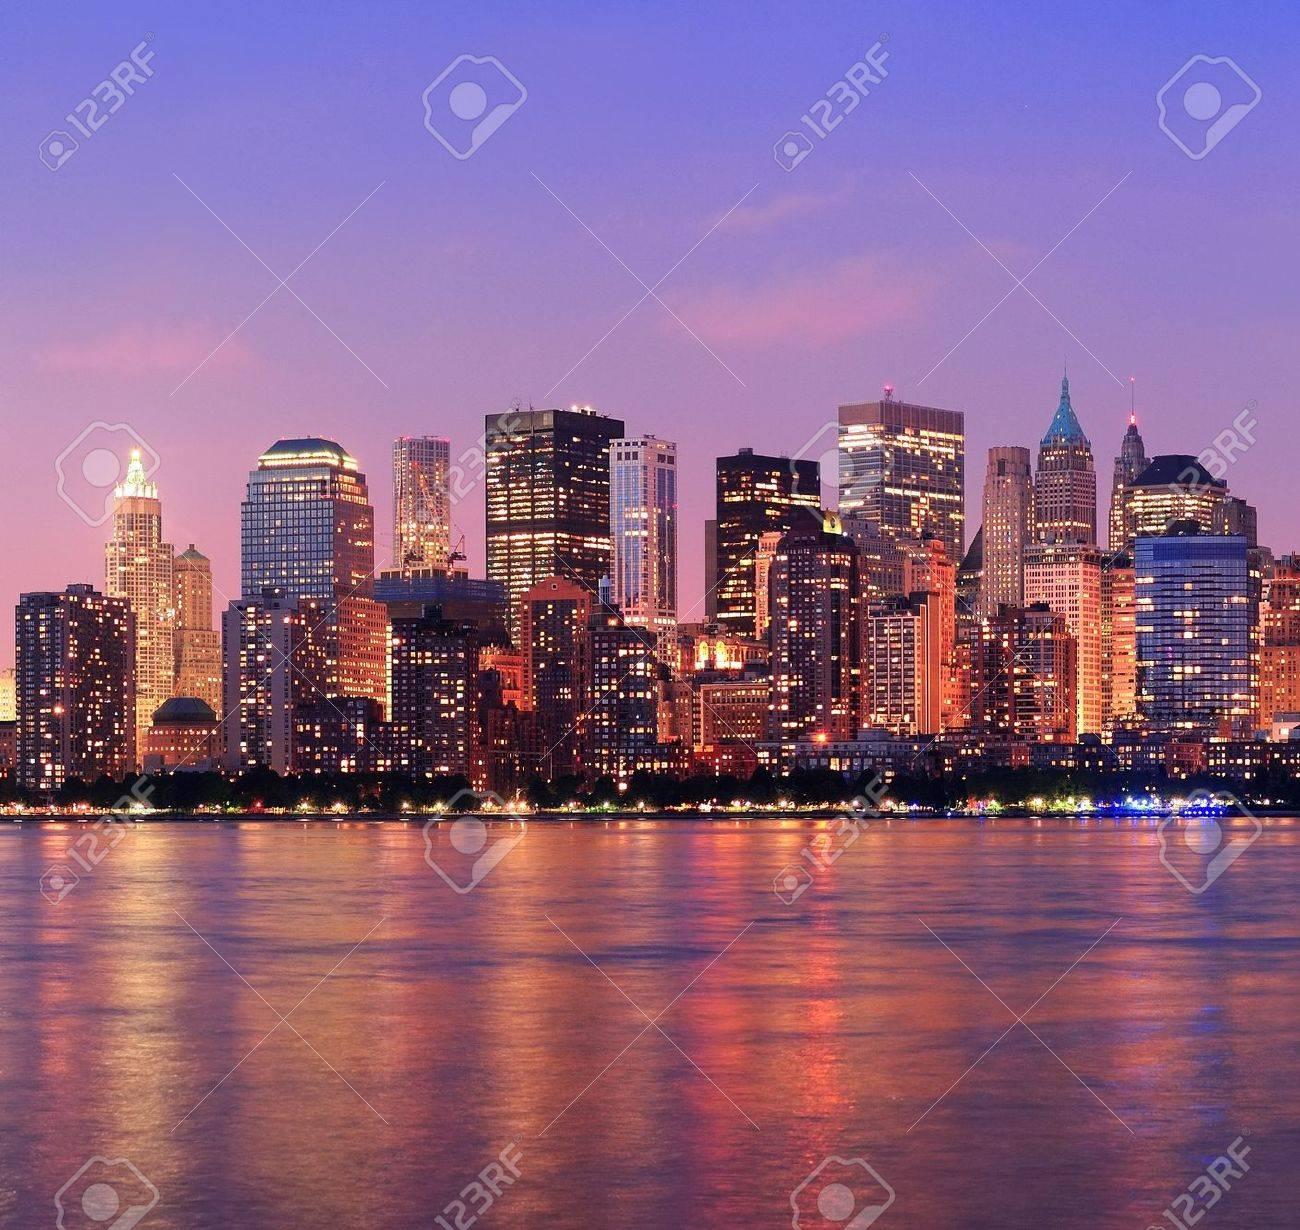 new york city manhattan skyline con rascacielos al anochecer iluminado sobre el ro hudson panorama foto